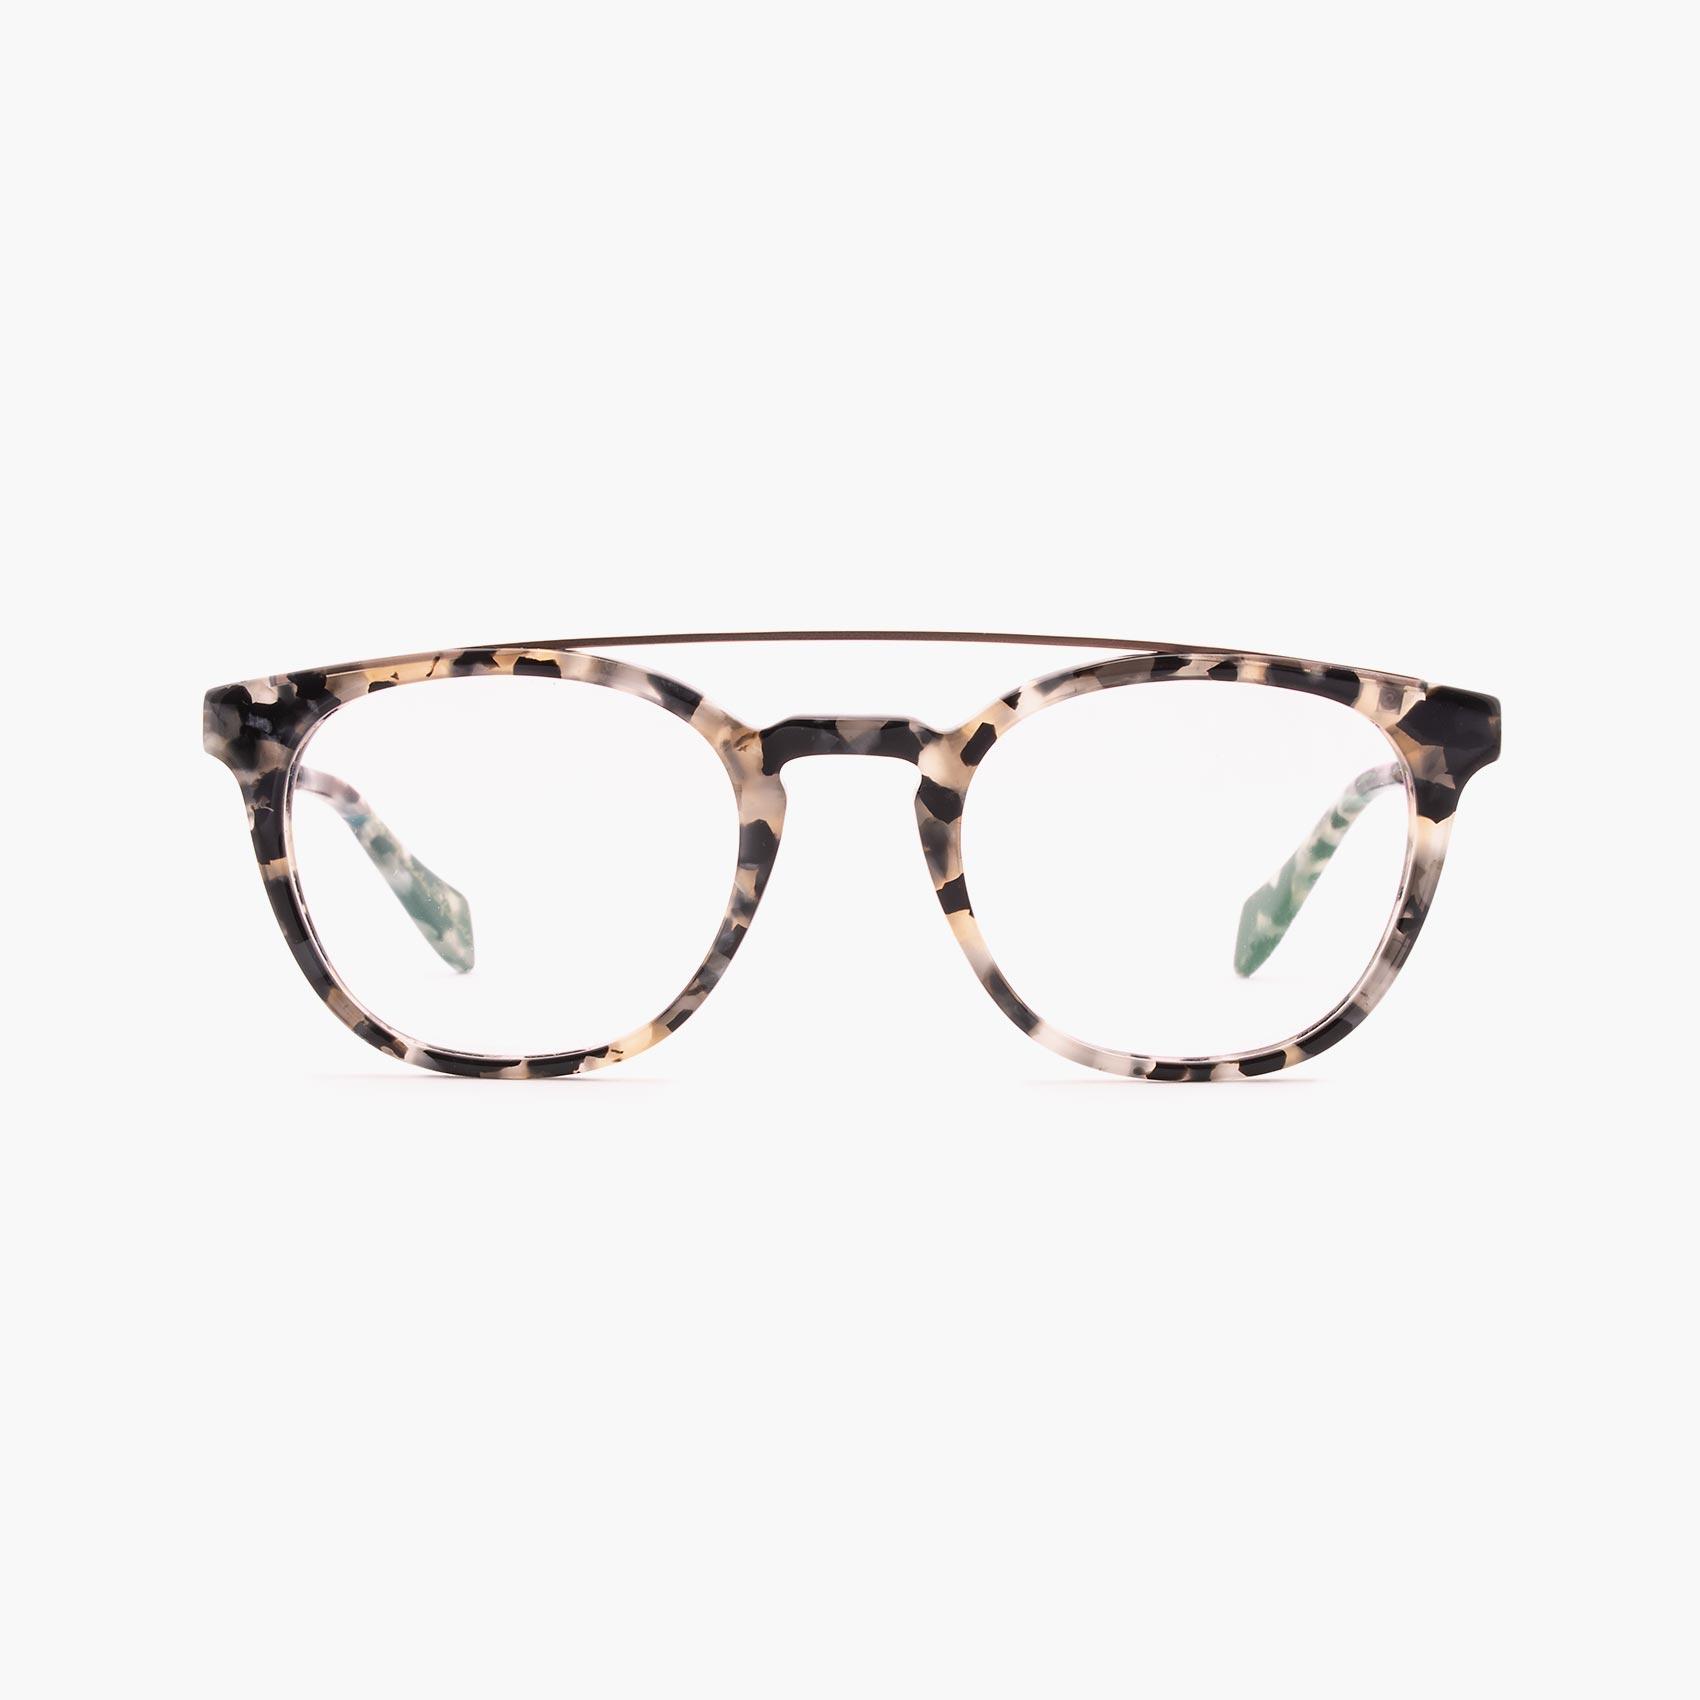 Proud eyewear Hilary C2 F gafas de acetato mujer puente doble